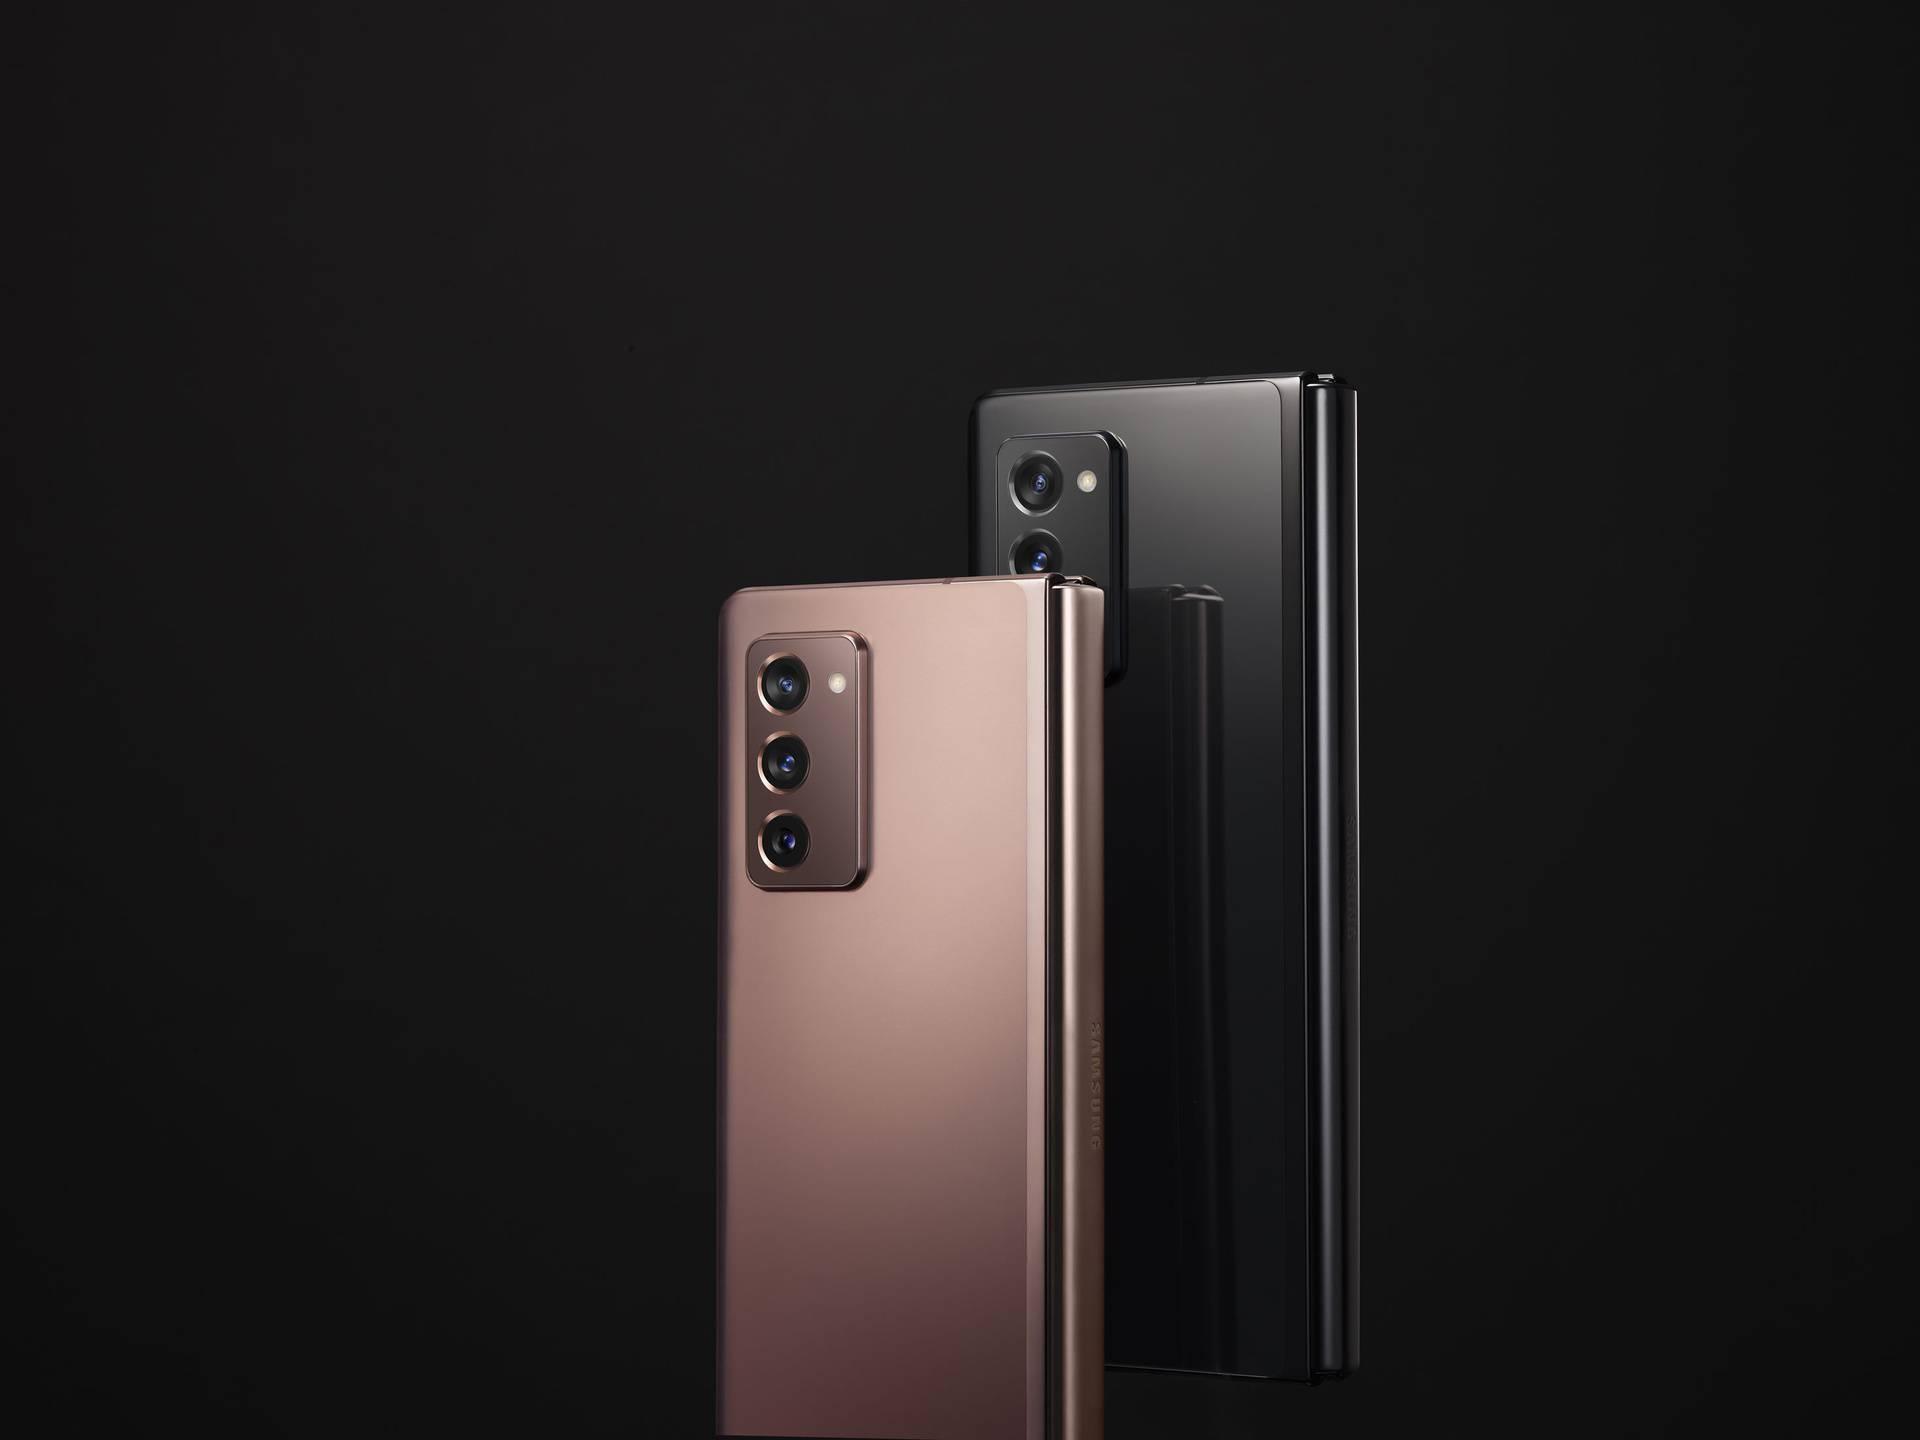 Nova era pametnih telefona uz Samsung Galaxy Z Fold2 5G